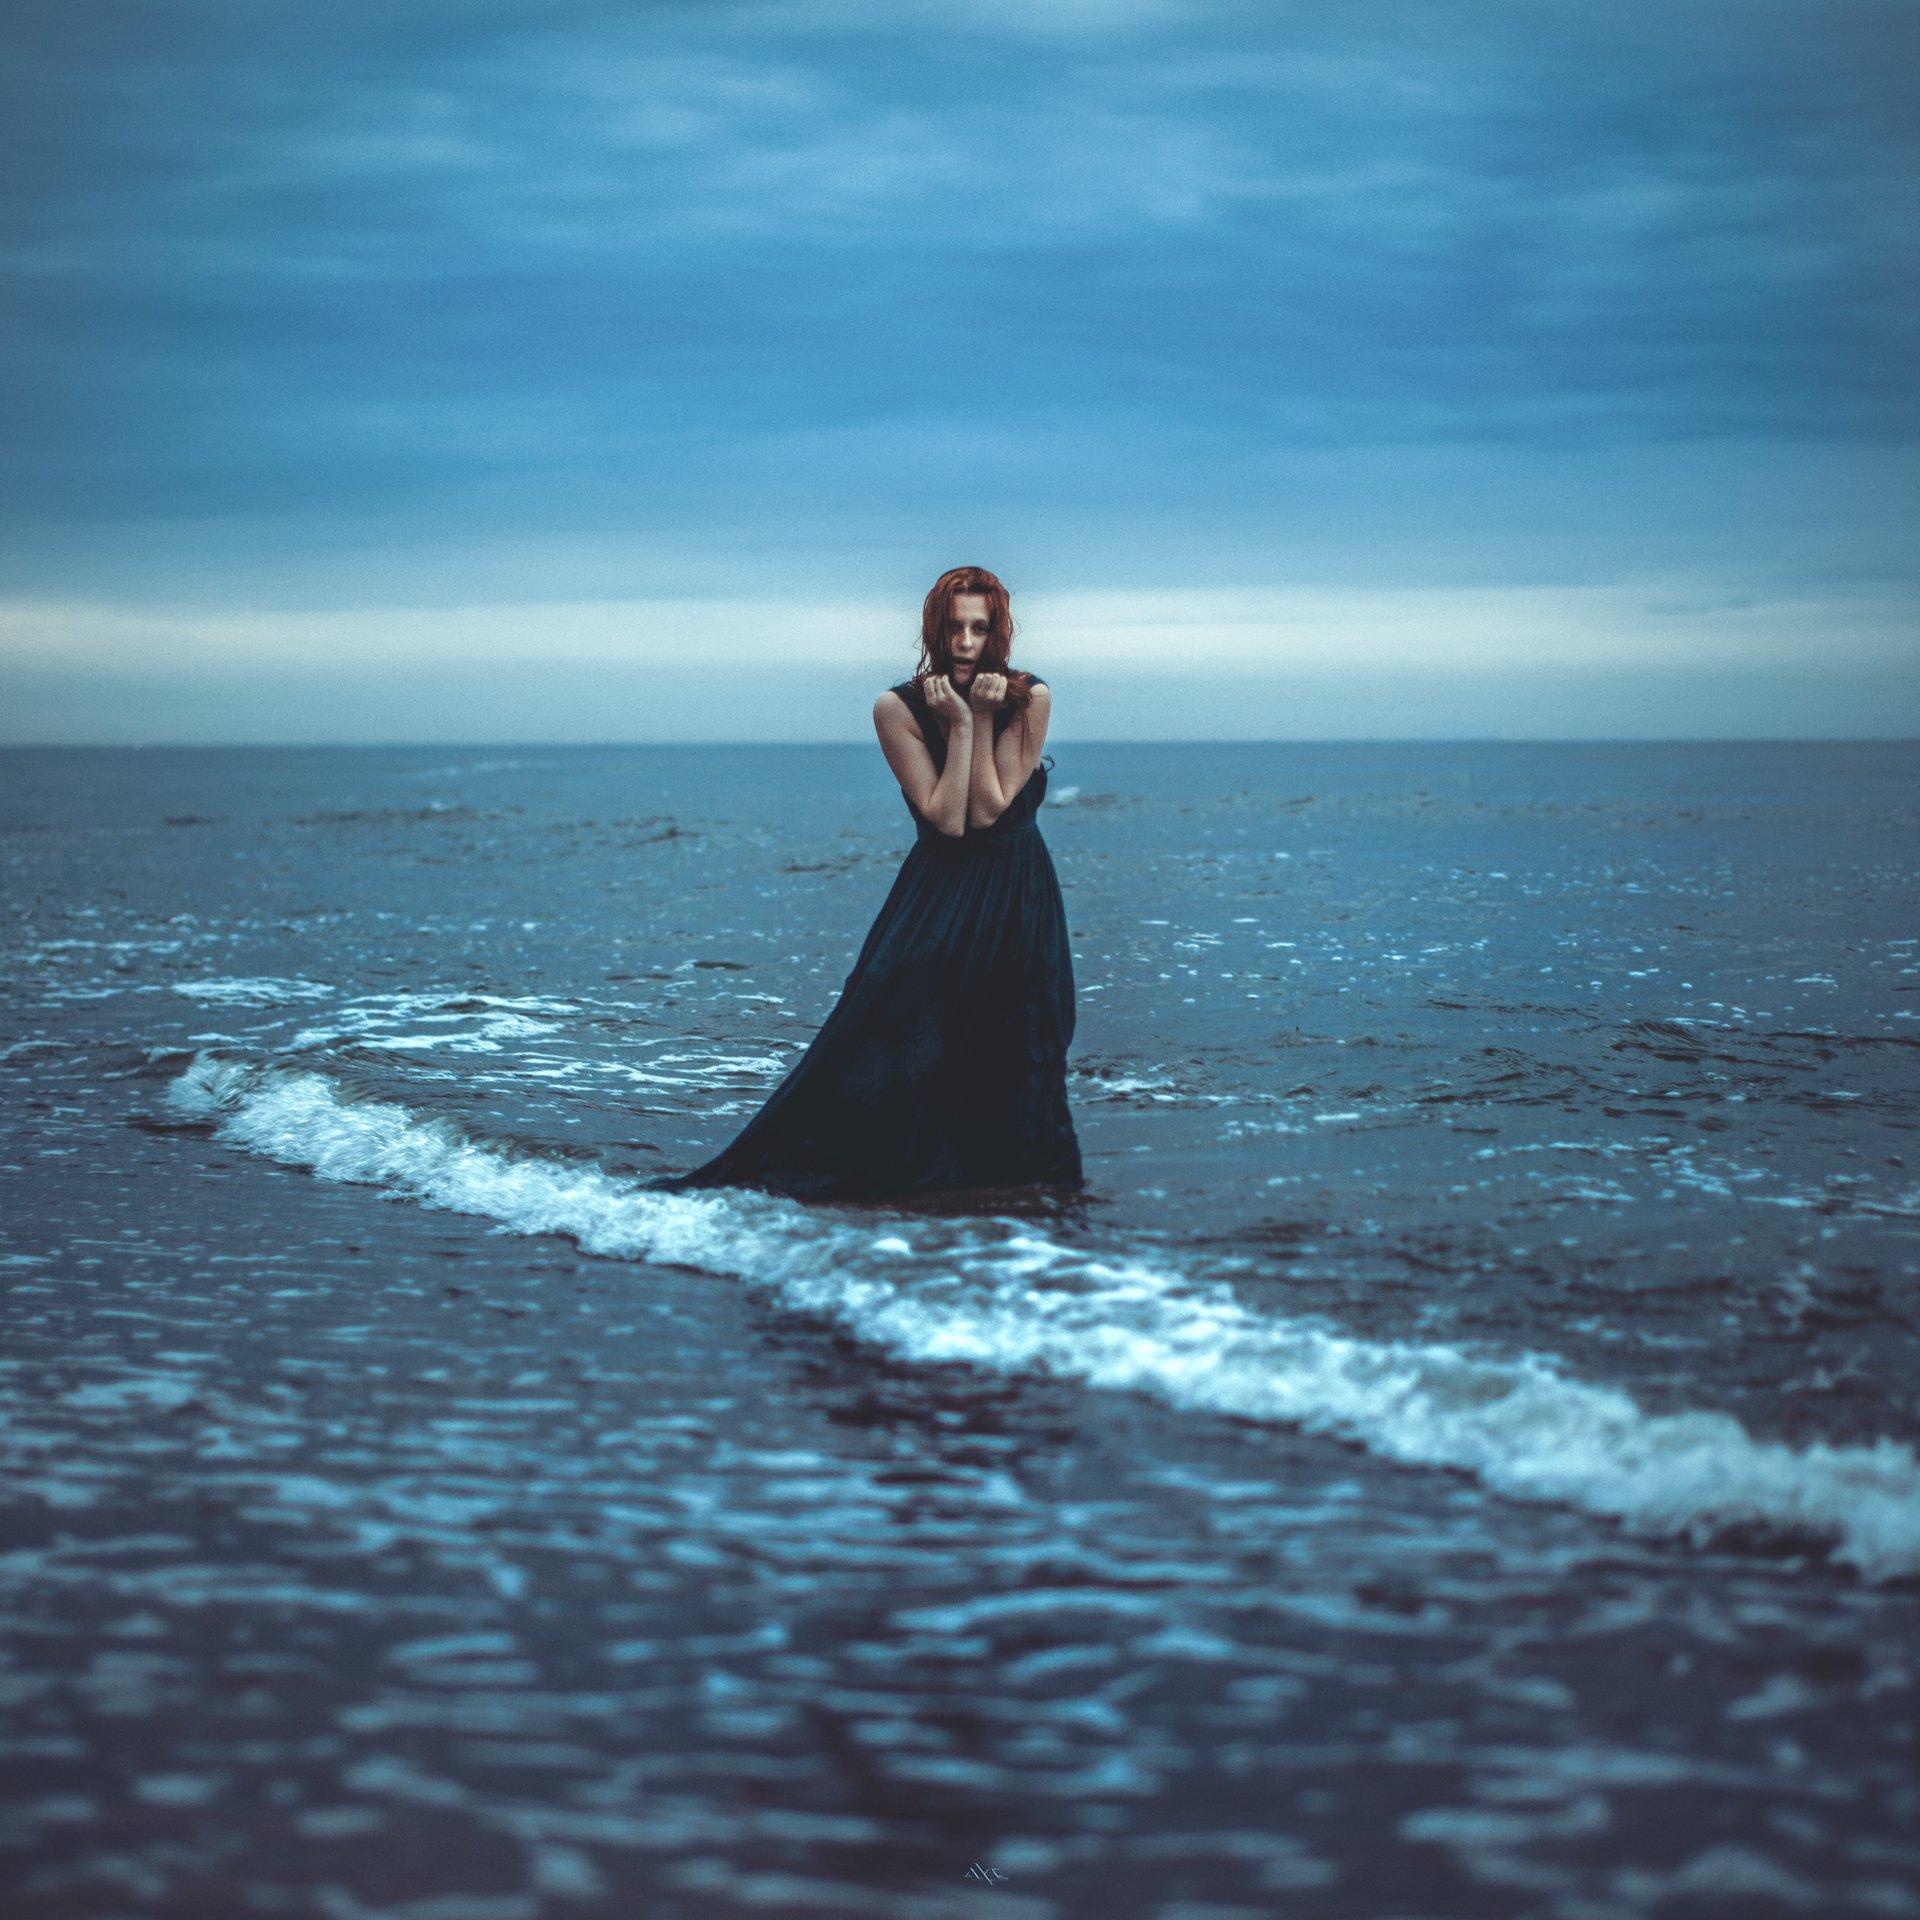 Portrait, Sea, Toning, Woman, Руслан Болгов (Axe)